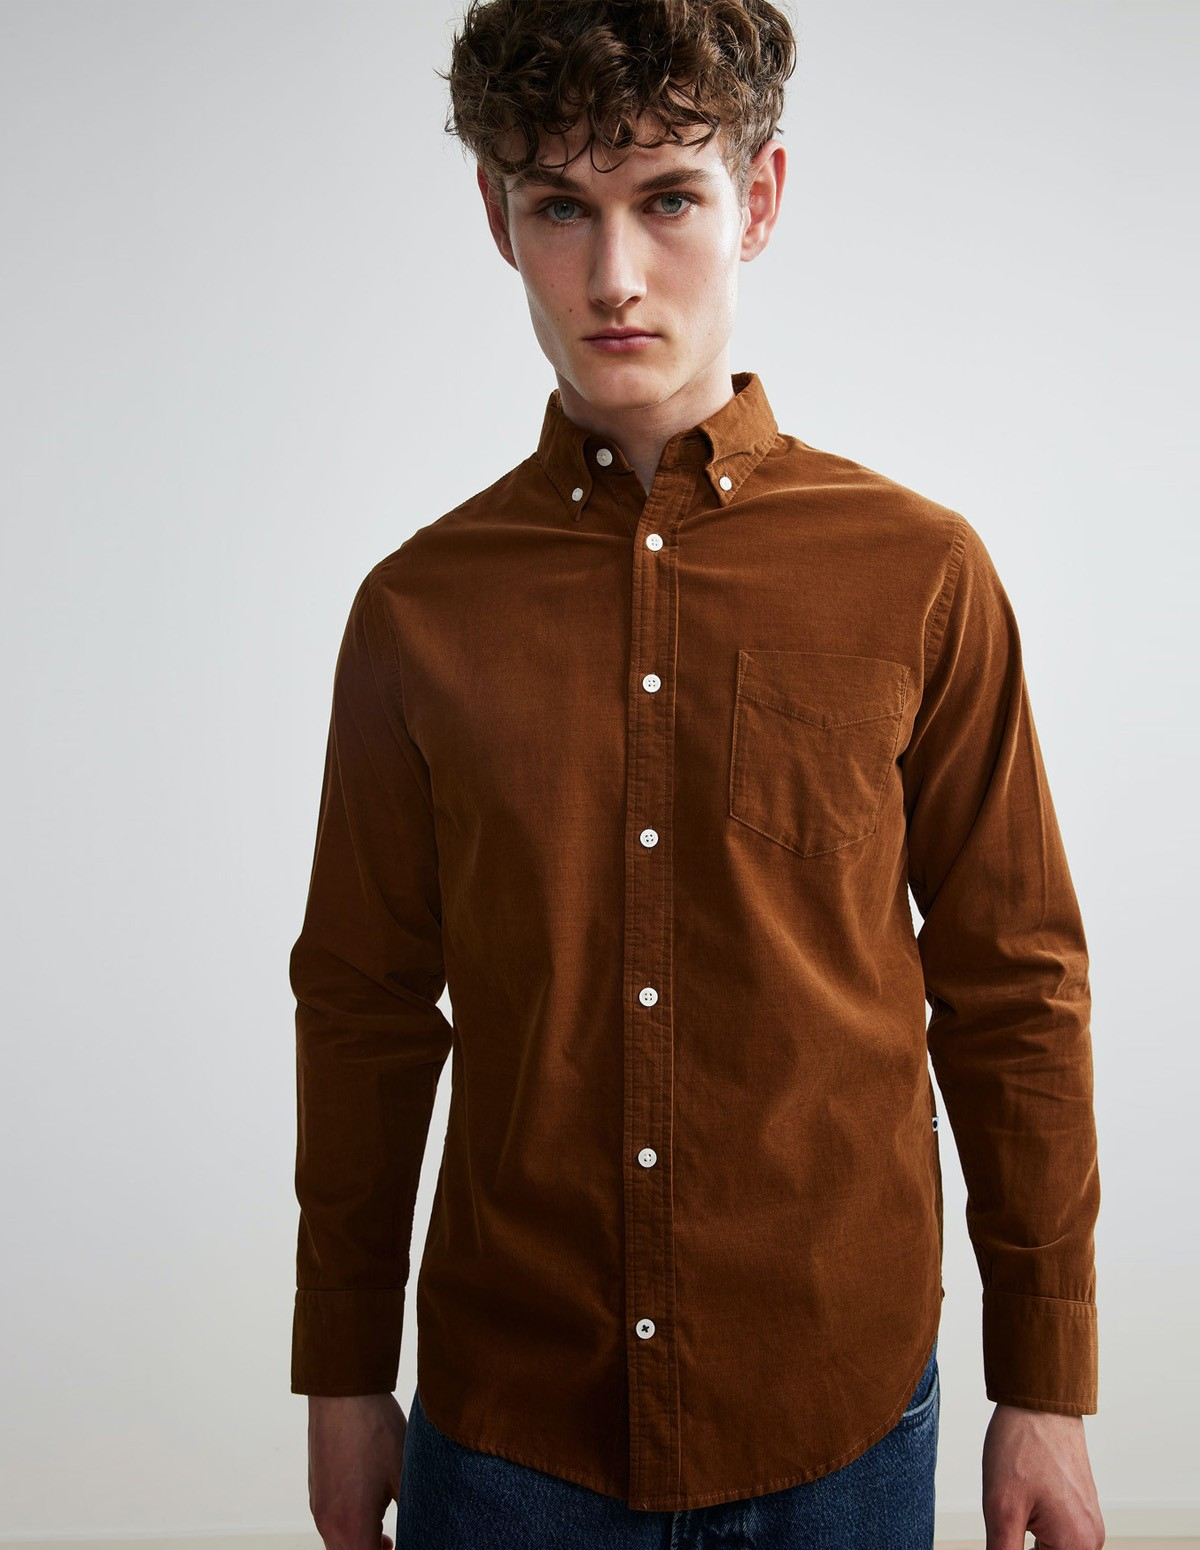 Nn07 Levon Corduroy Shirt - 801 CANELA BROWN